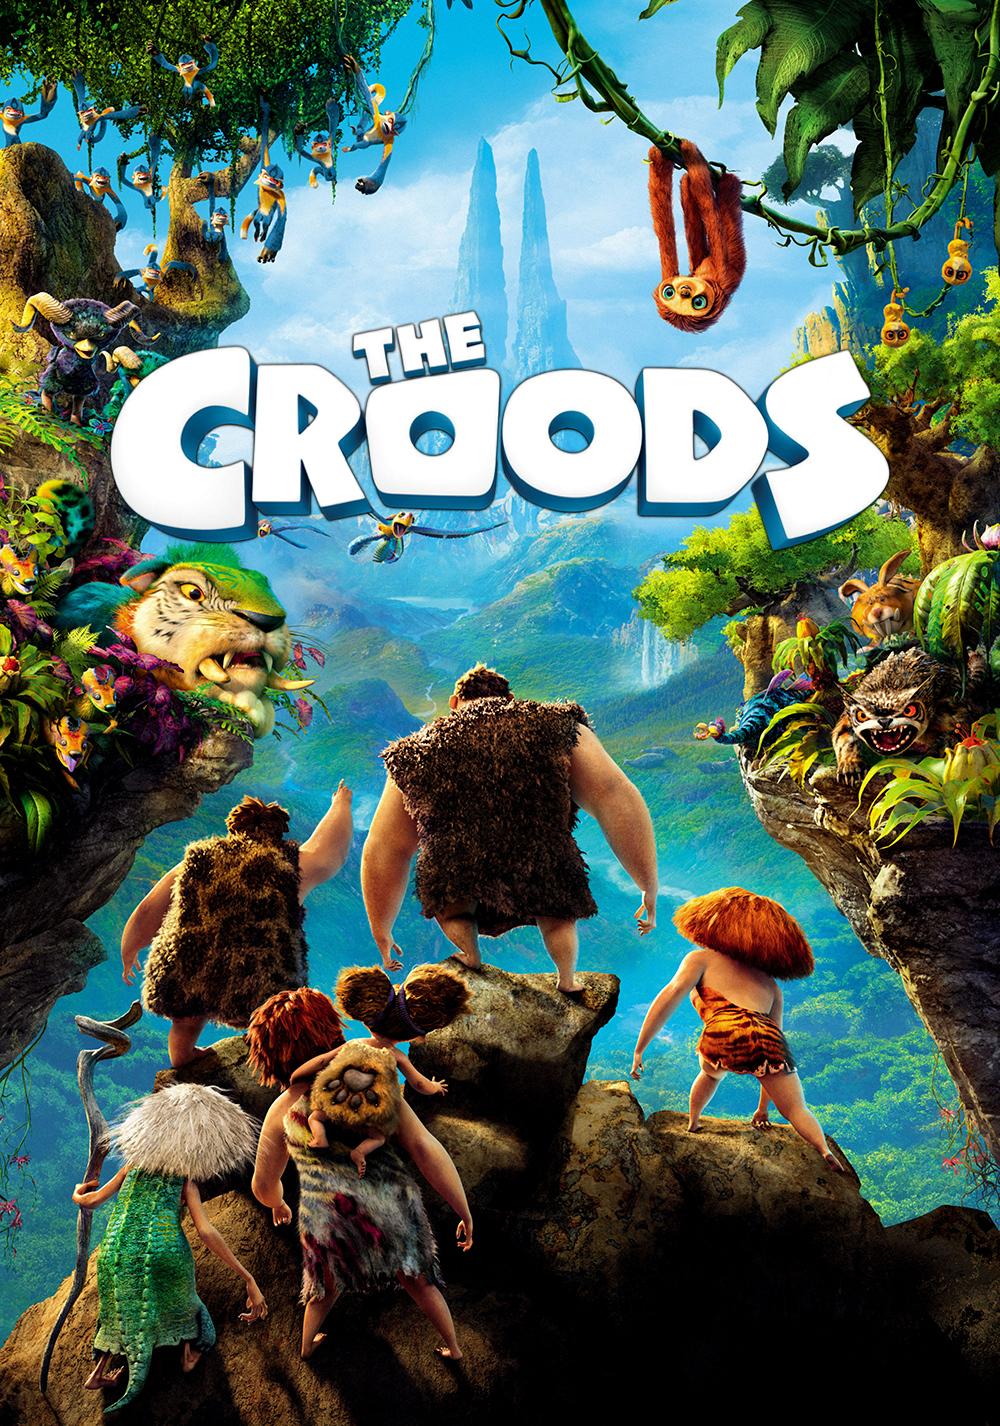 the croods | movie fanart | fanart.tv